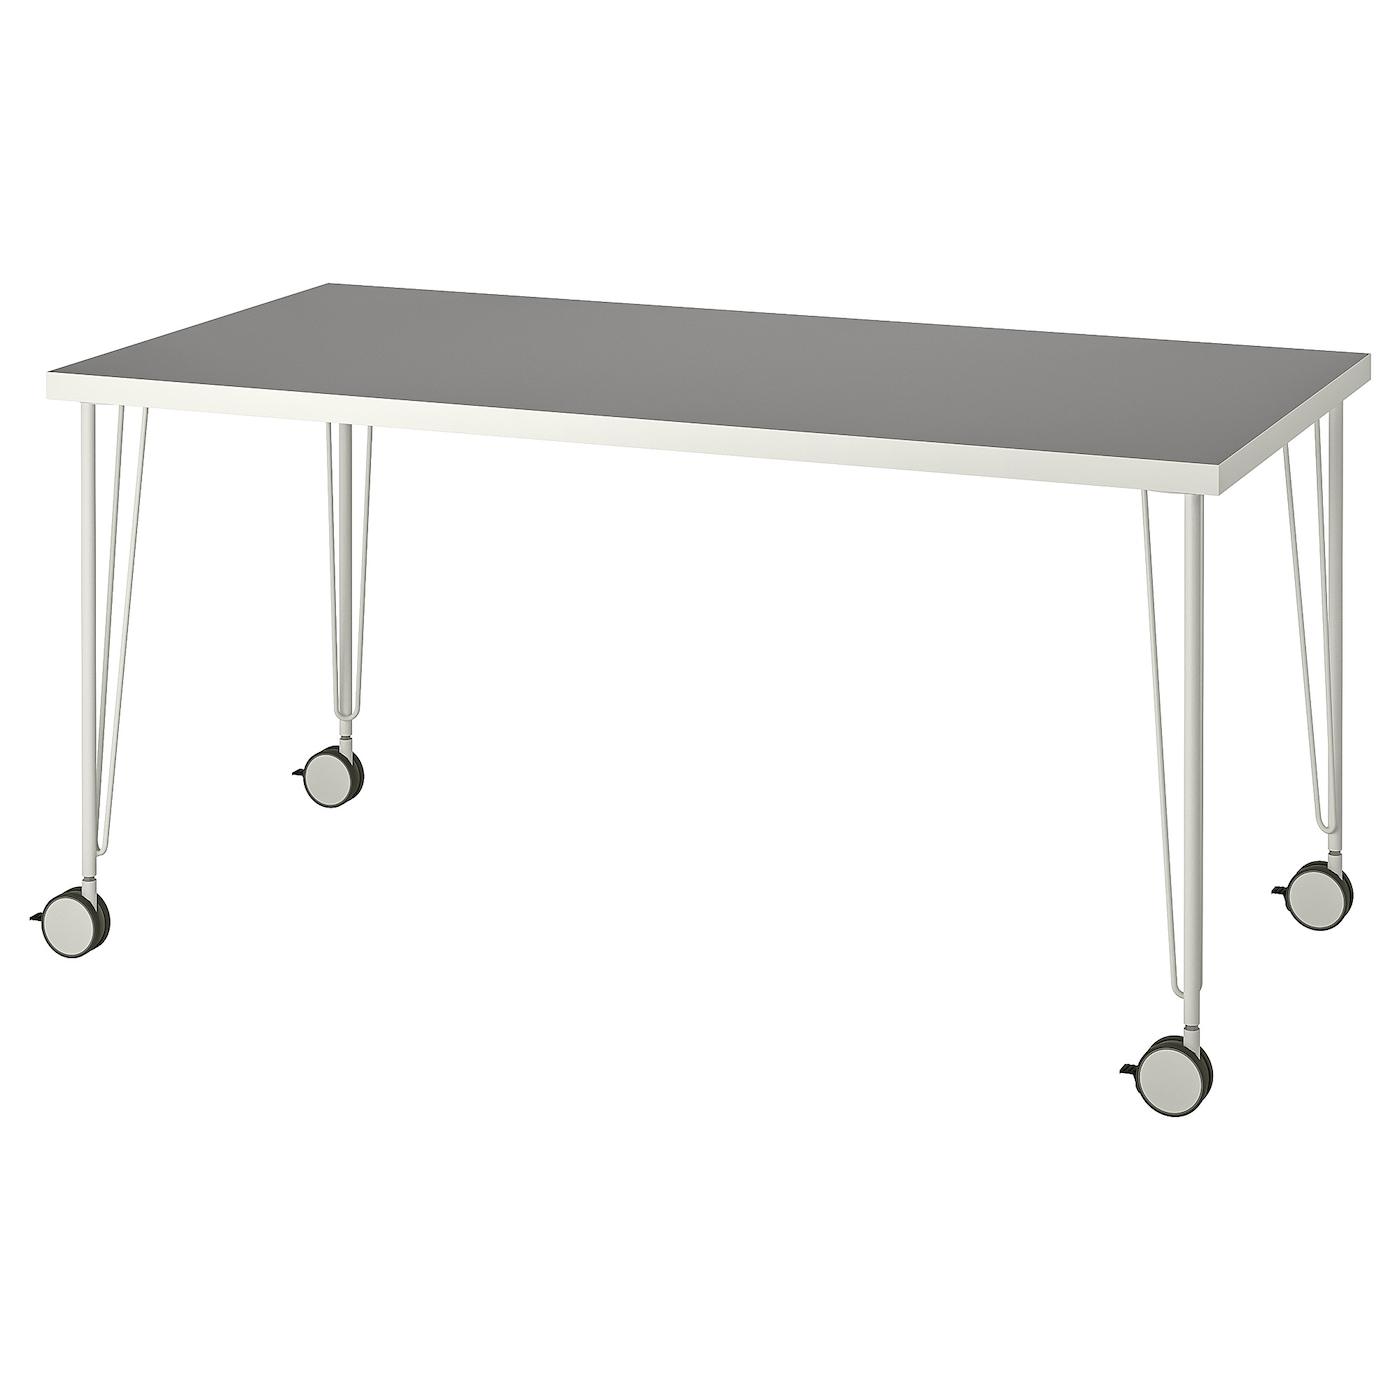 Linnmon Table Top Light Grey White 150x75 Cm Ikea Ireland